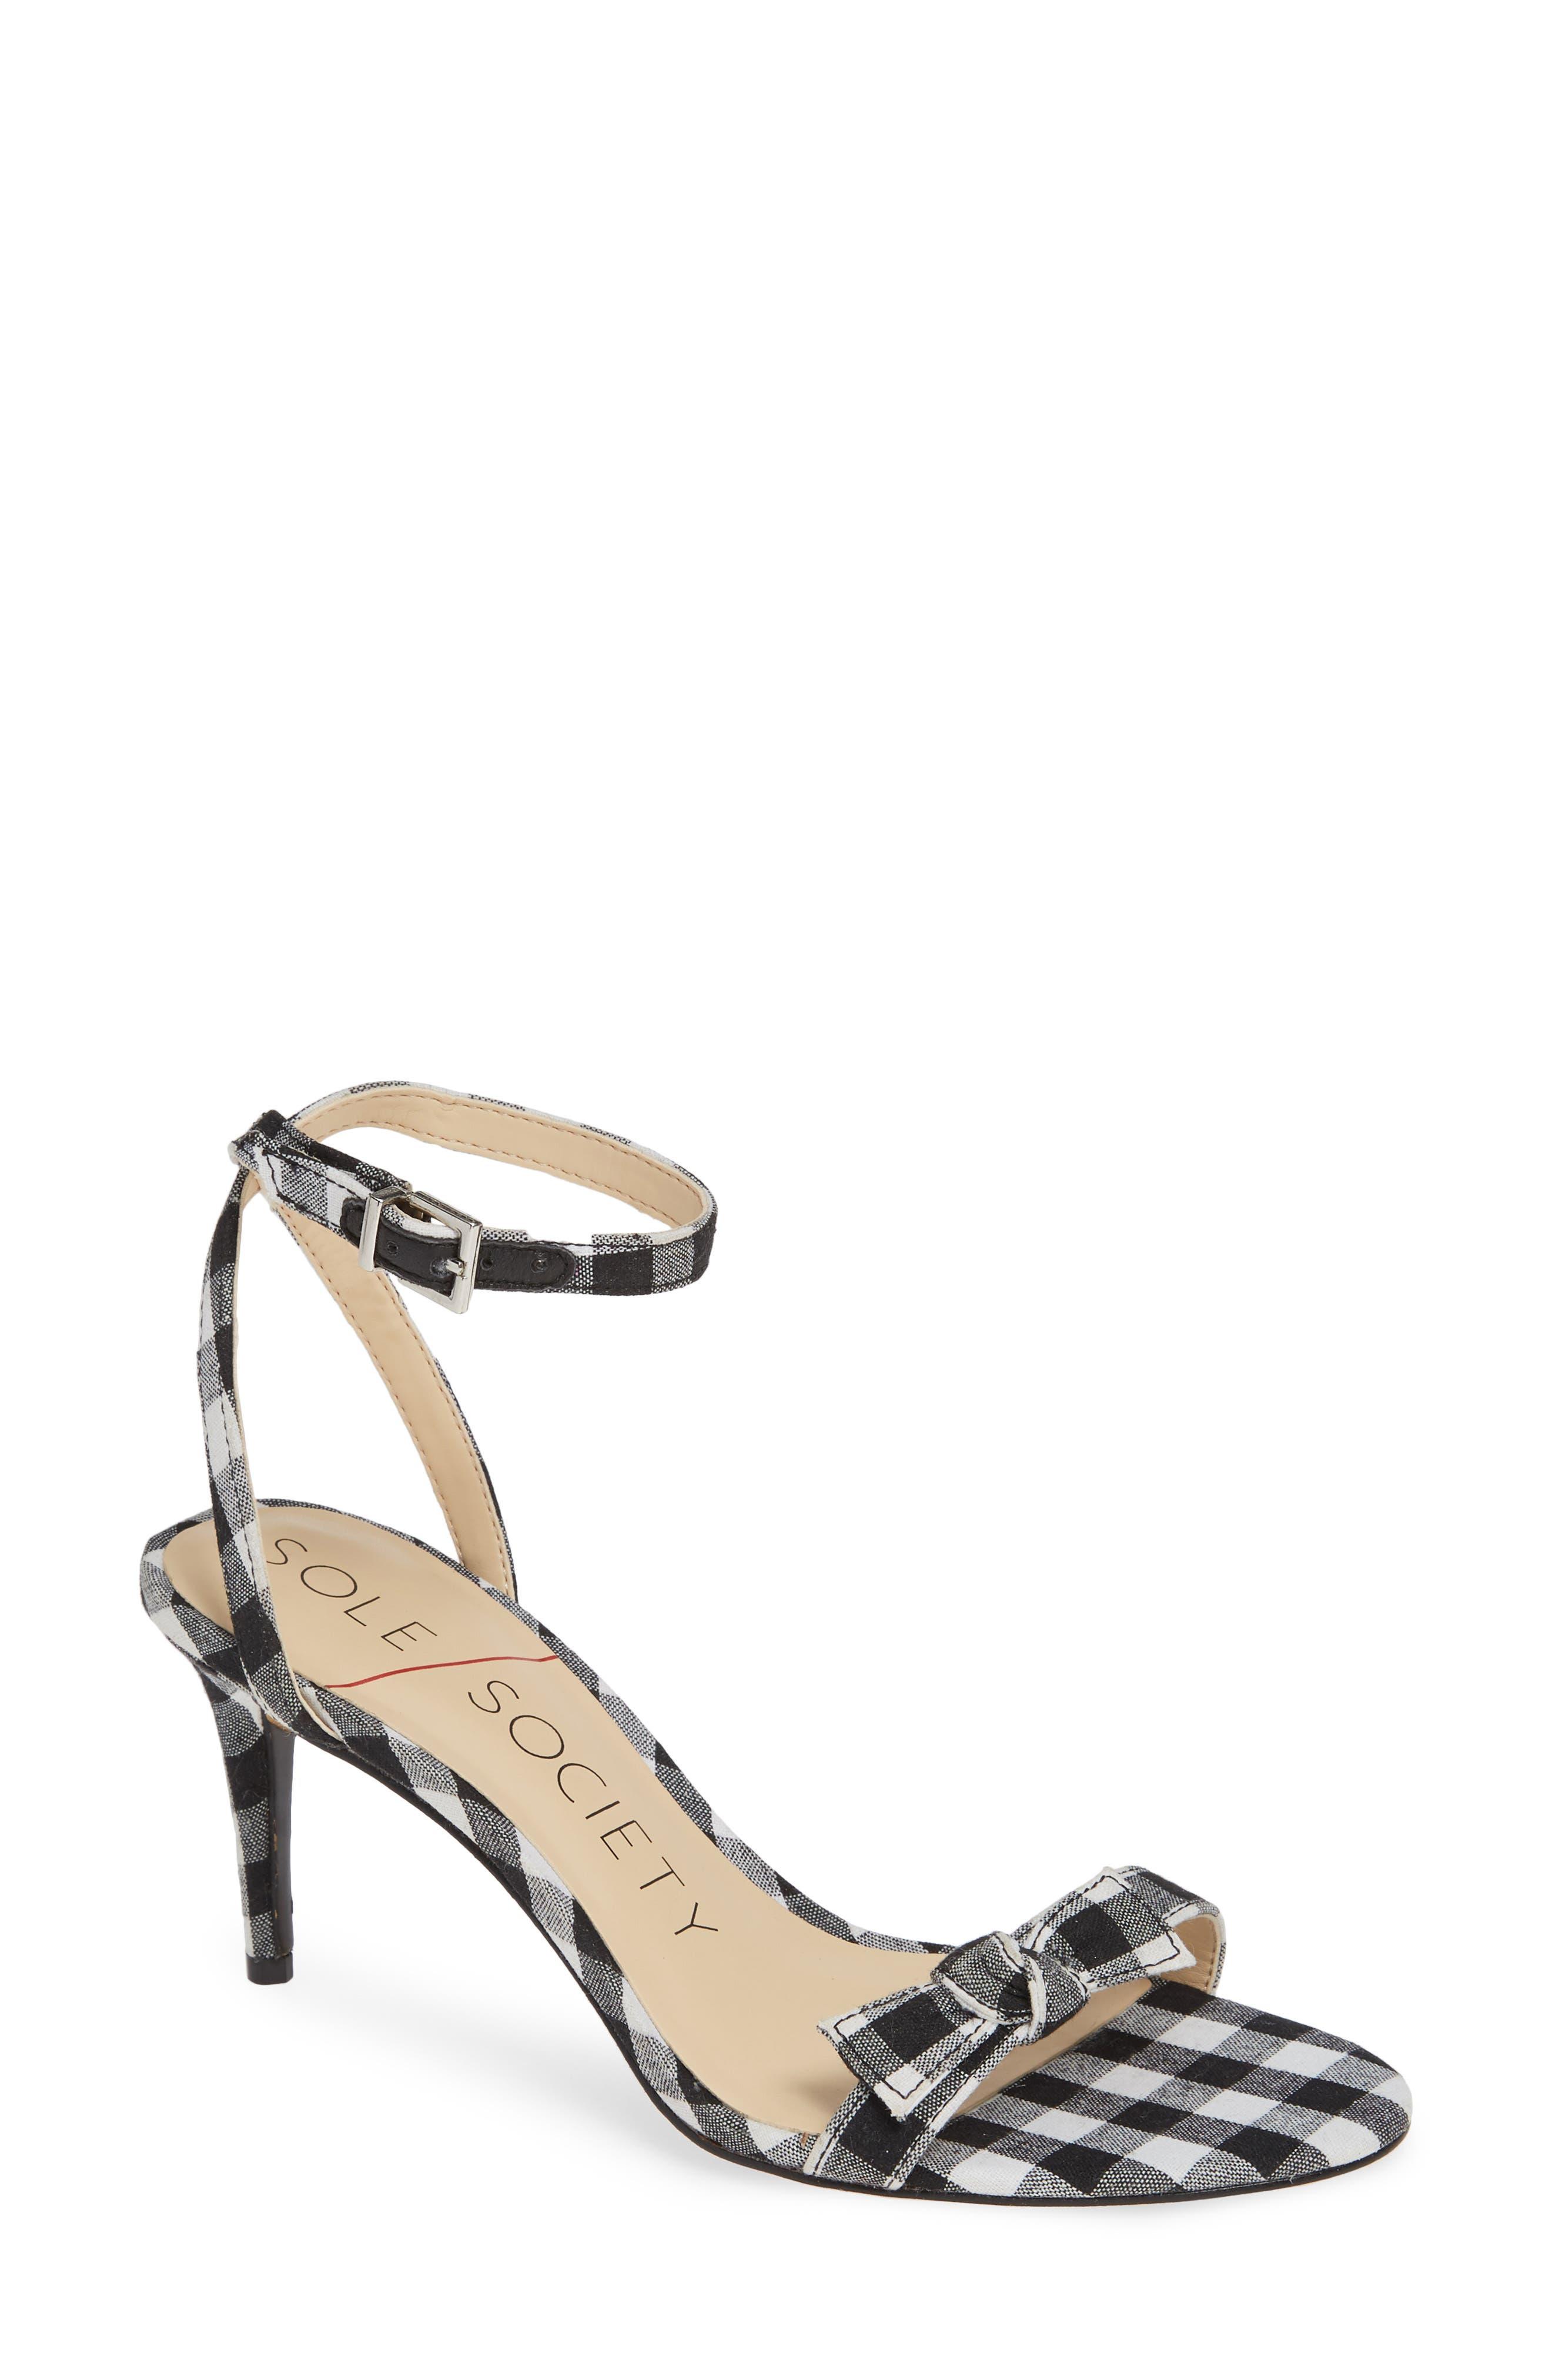 Avrilie Knotted Sandal,                             Main thumbnail 1, color,                             Black/ White Gingham